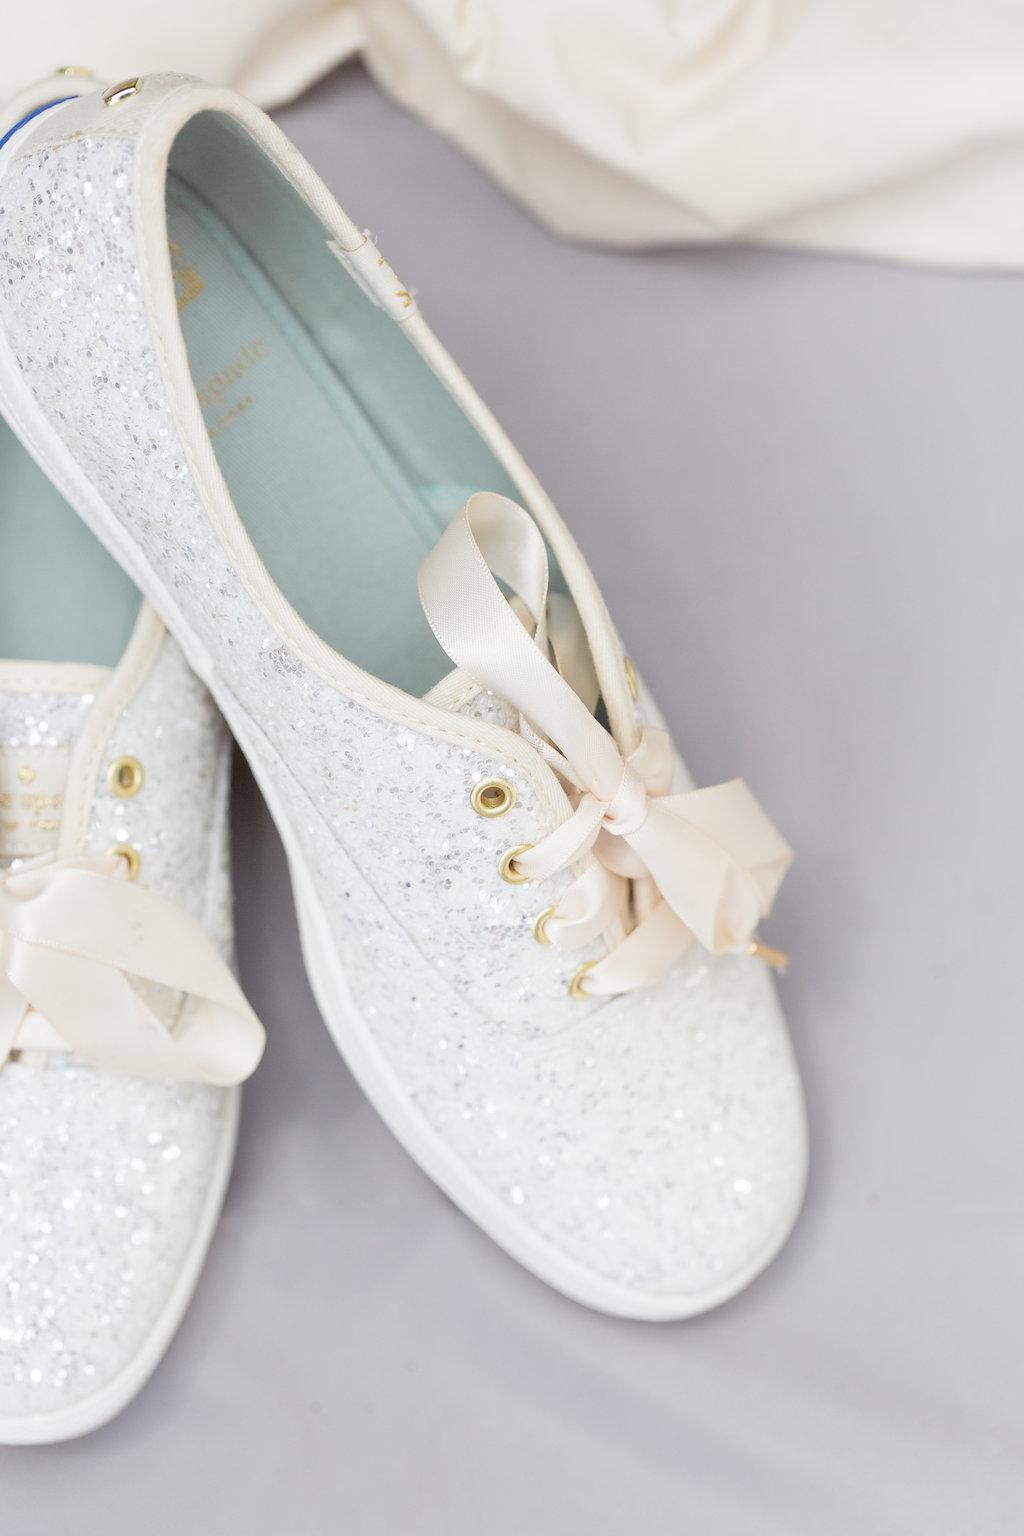 Flat White Bridal Tennis Shoes - Musgrove Plantation Georgia Wedding Venue